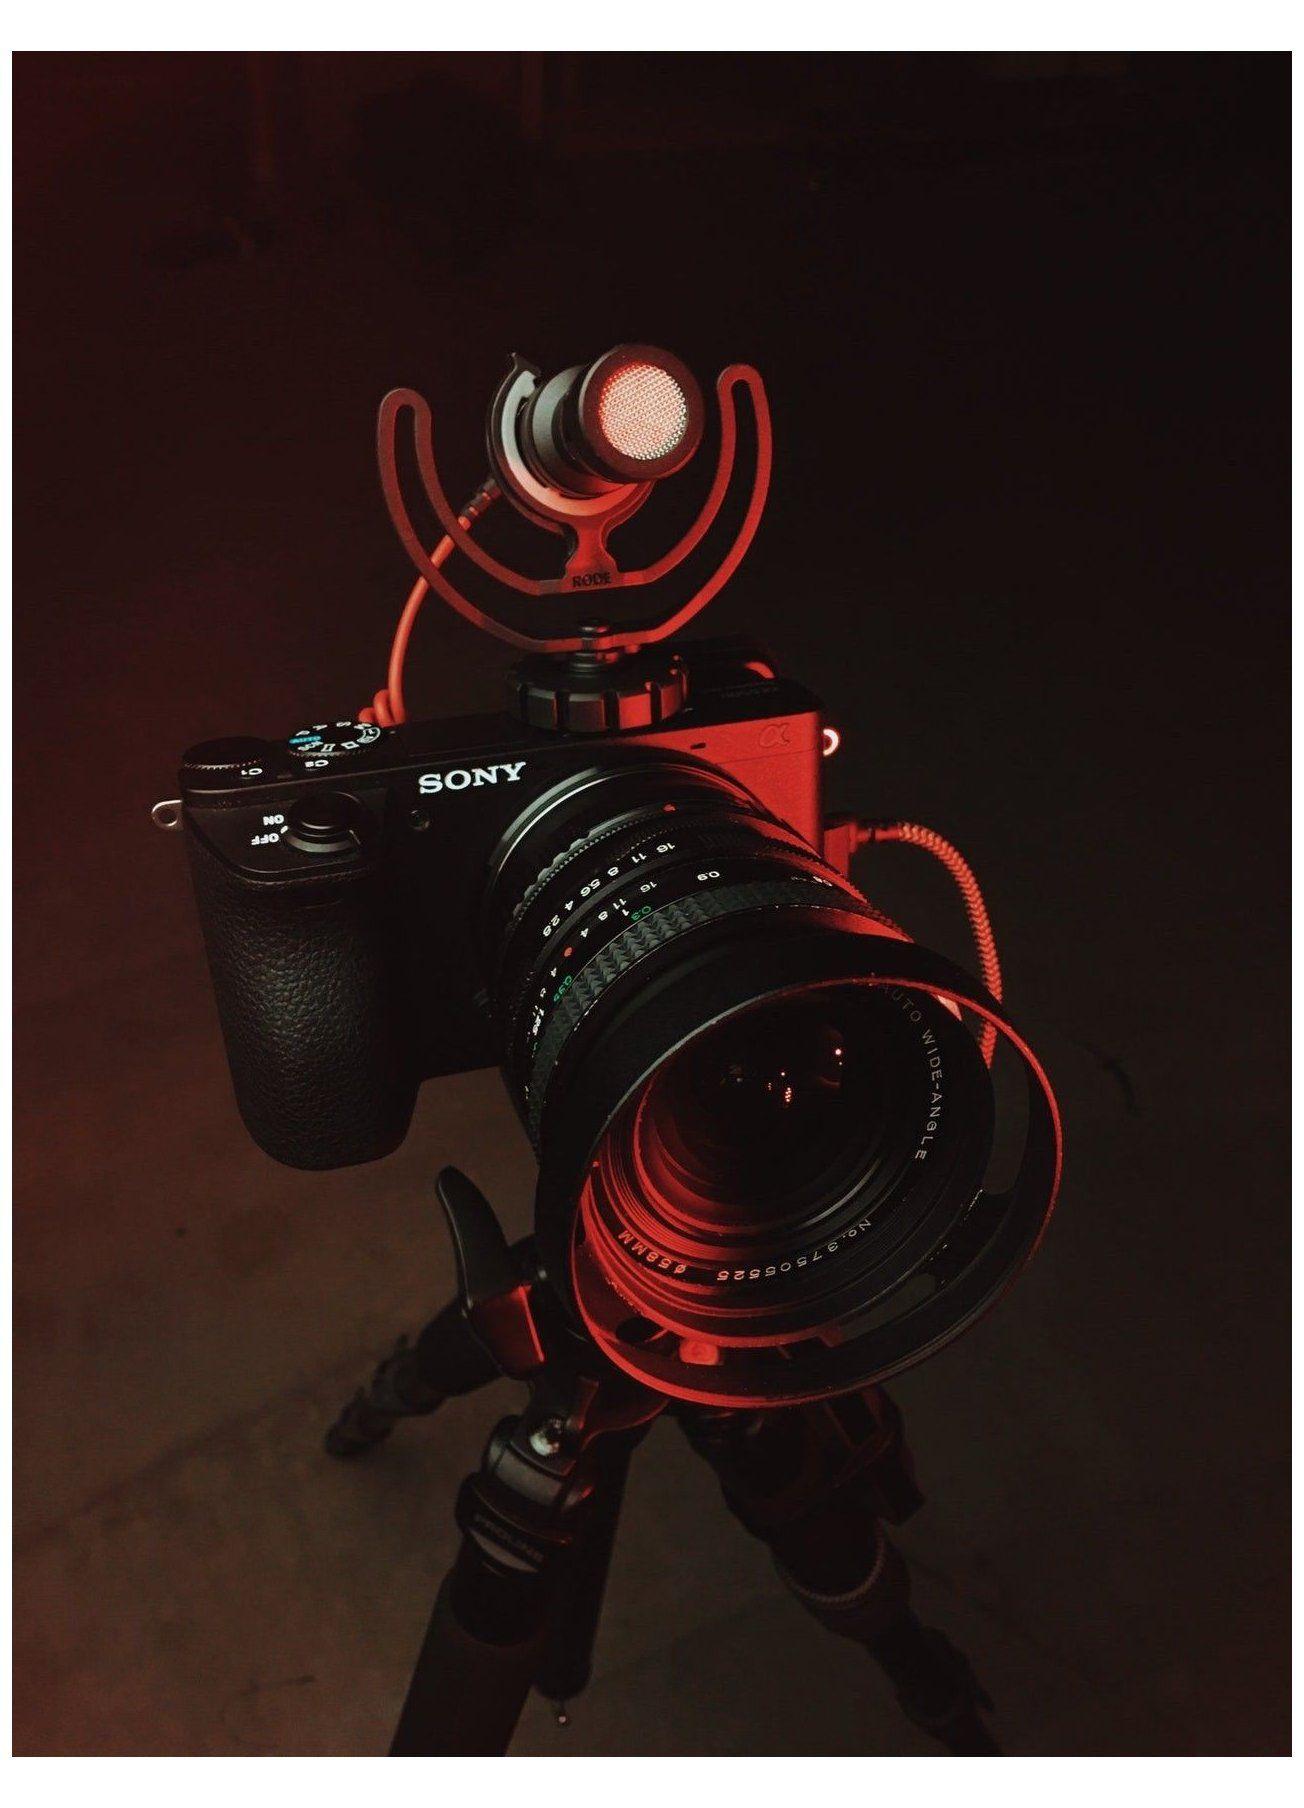 Red Camera aesthetic wallpaper iphone camera